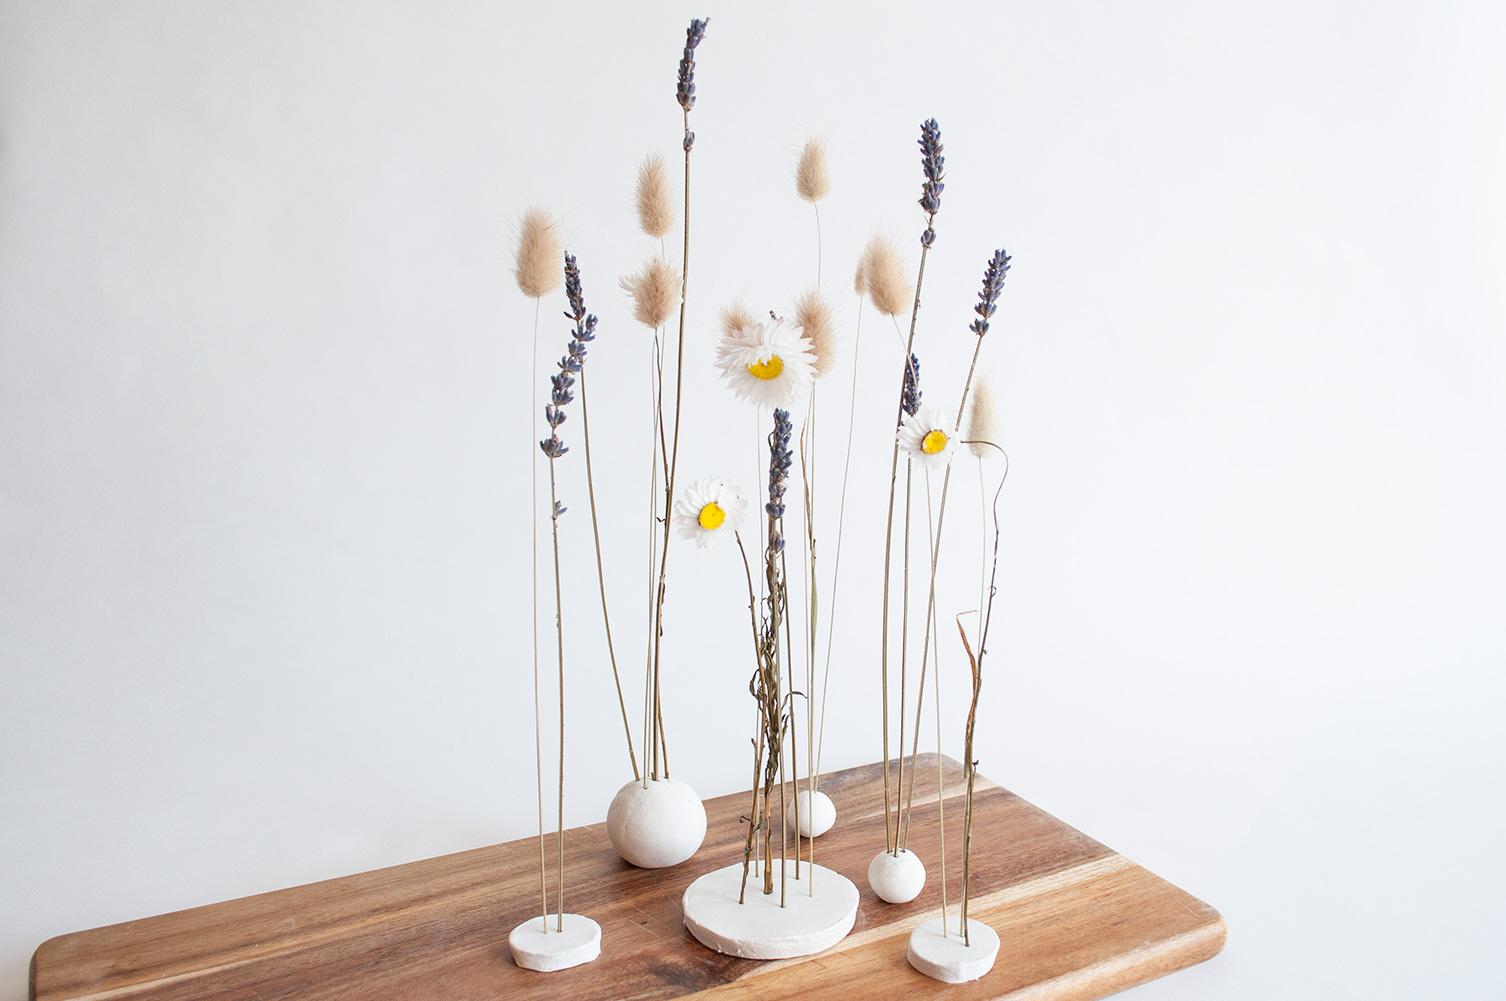 diy kleistandaard droogbloemen resultaat plank 1